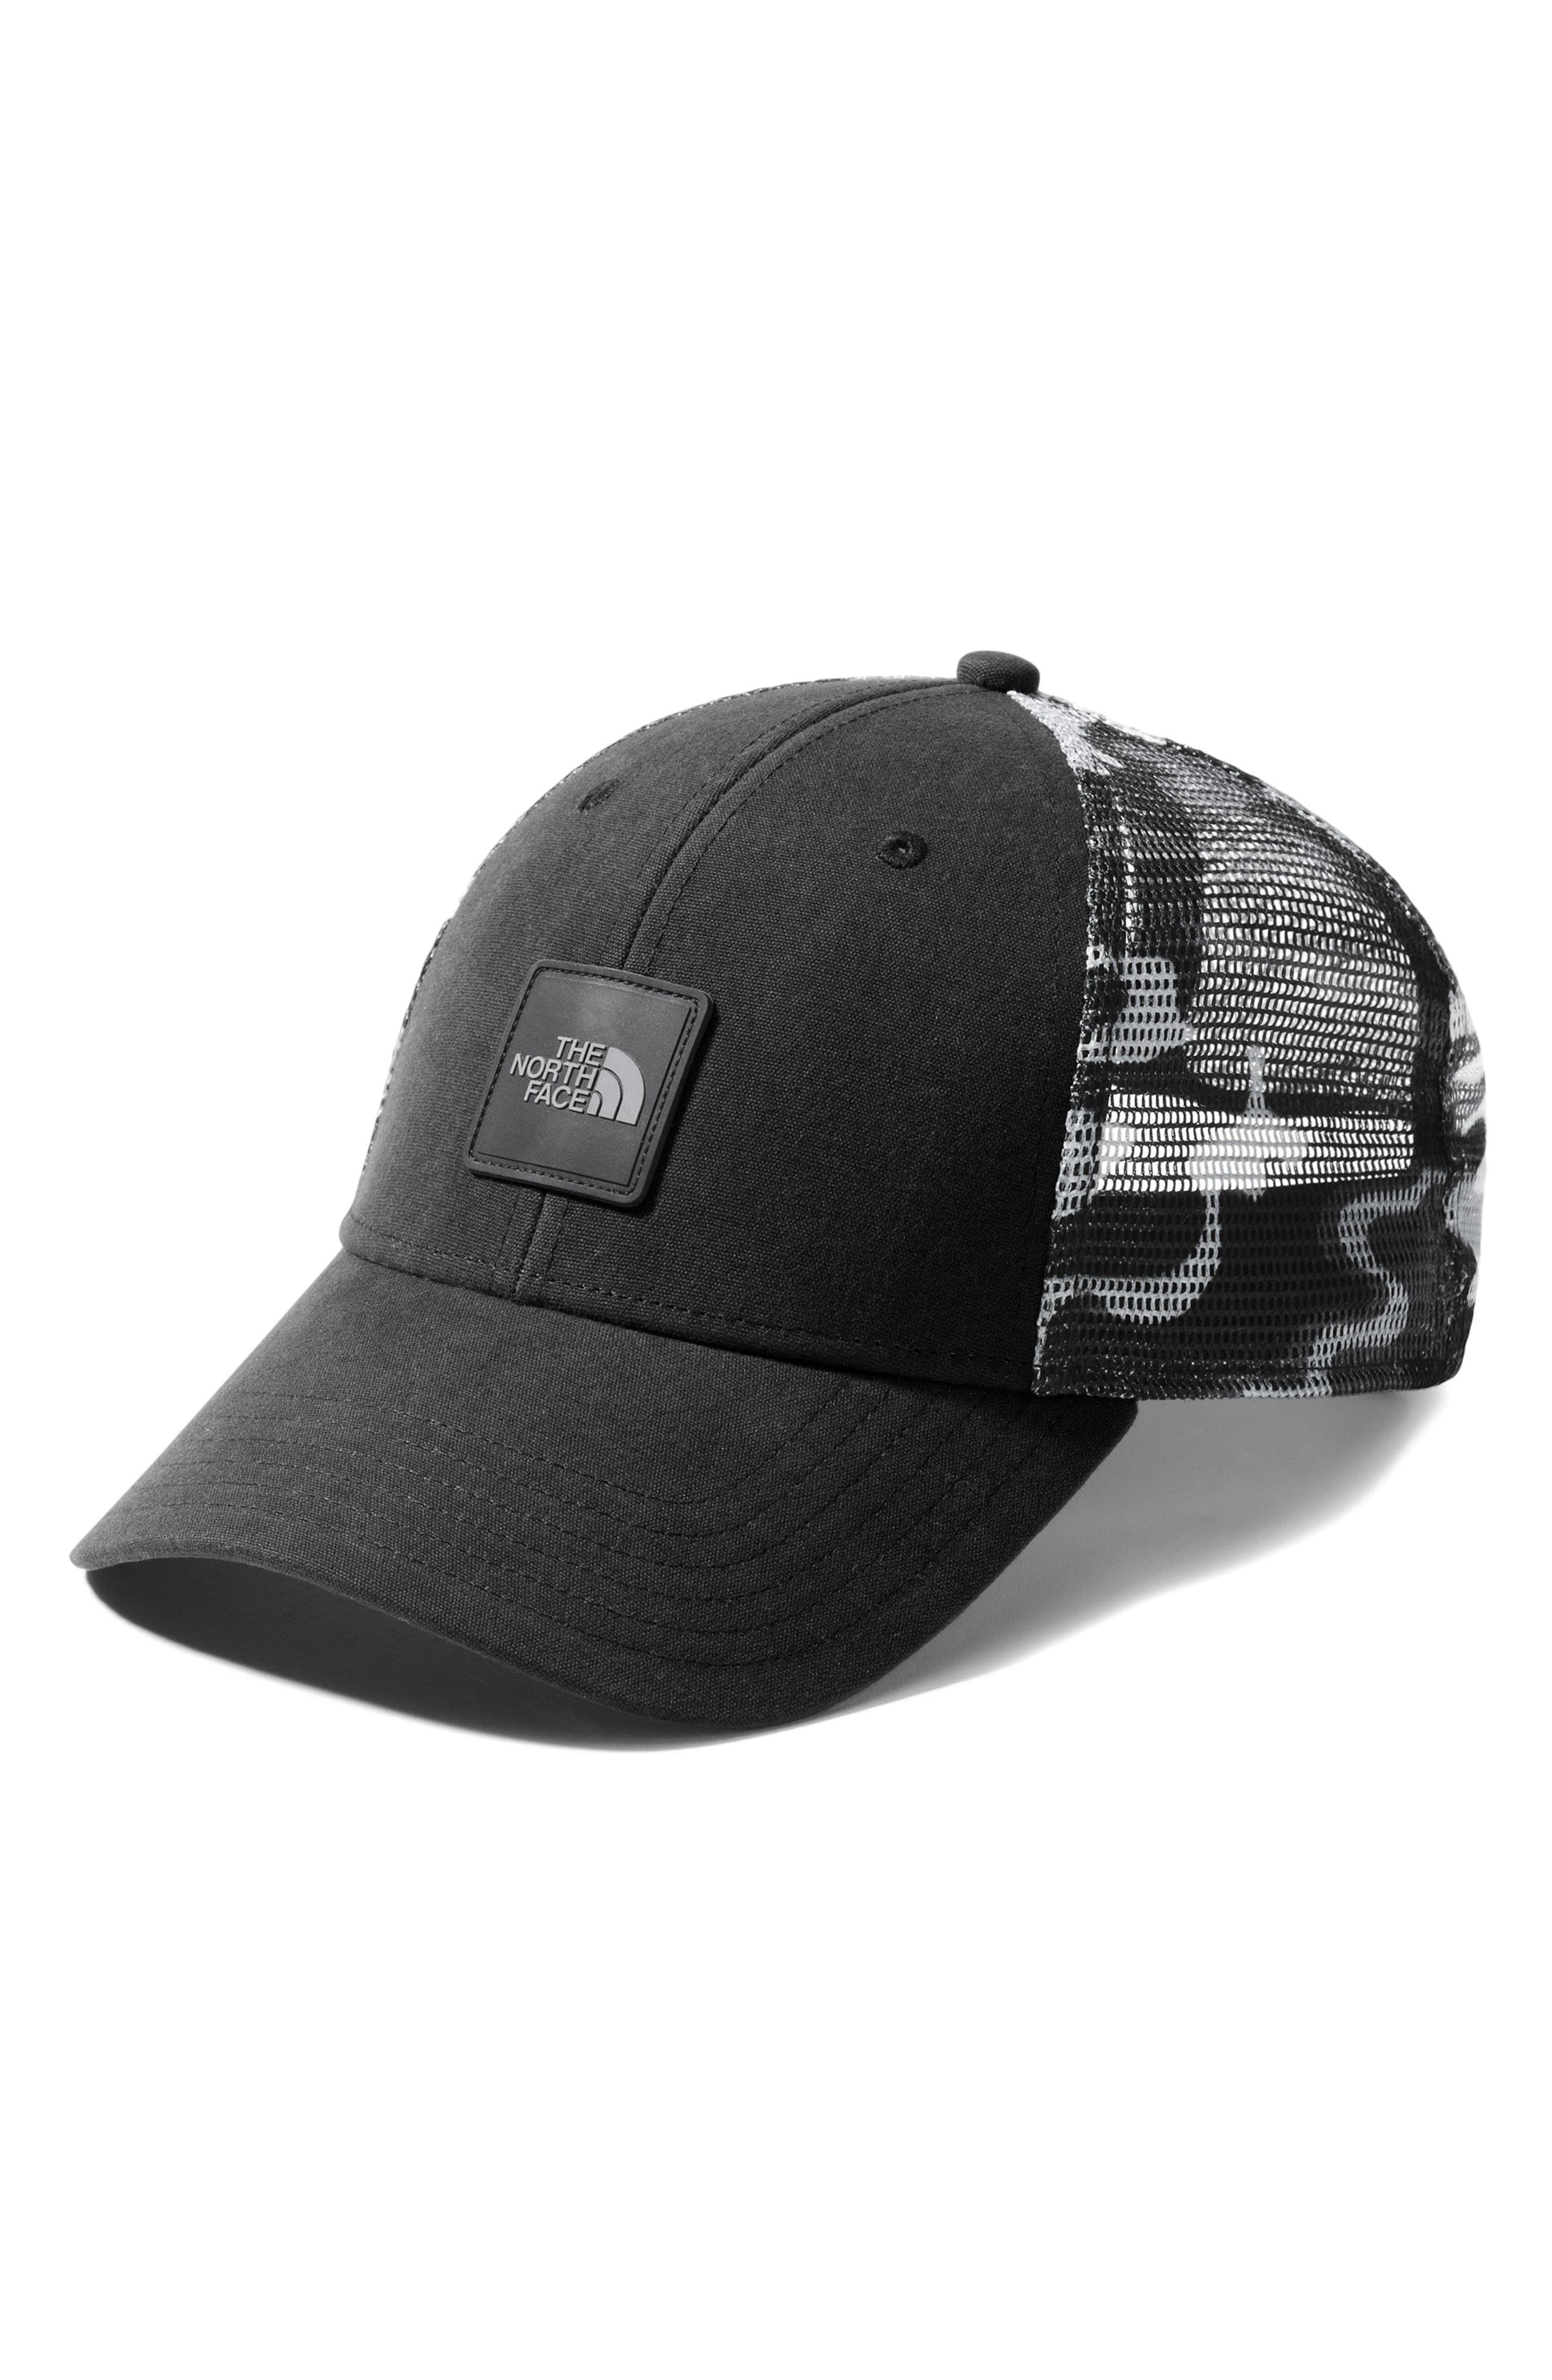 e519dbf8d045ac Men's The North Face Mudder Trucker Cap - Beige in 2019   Products ...